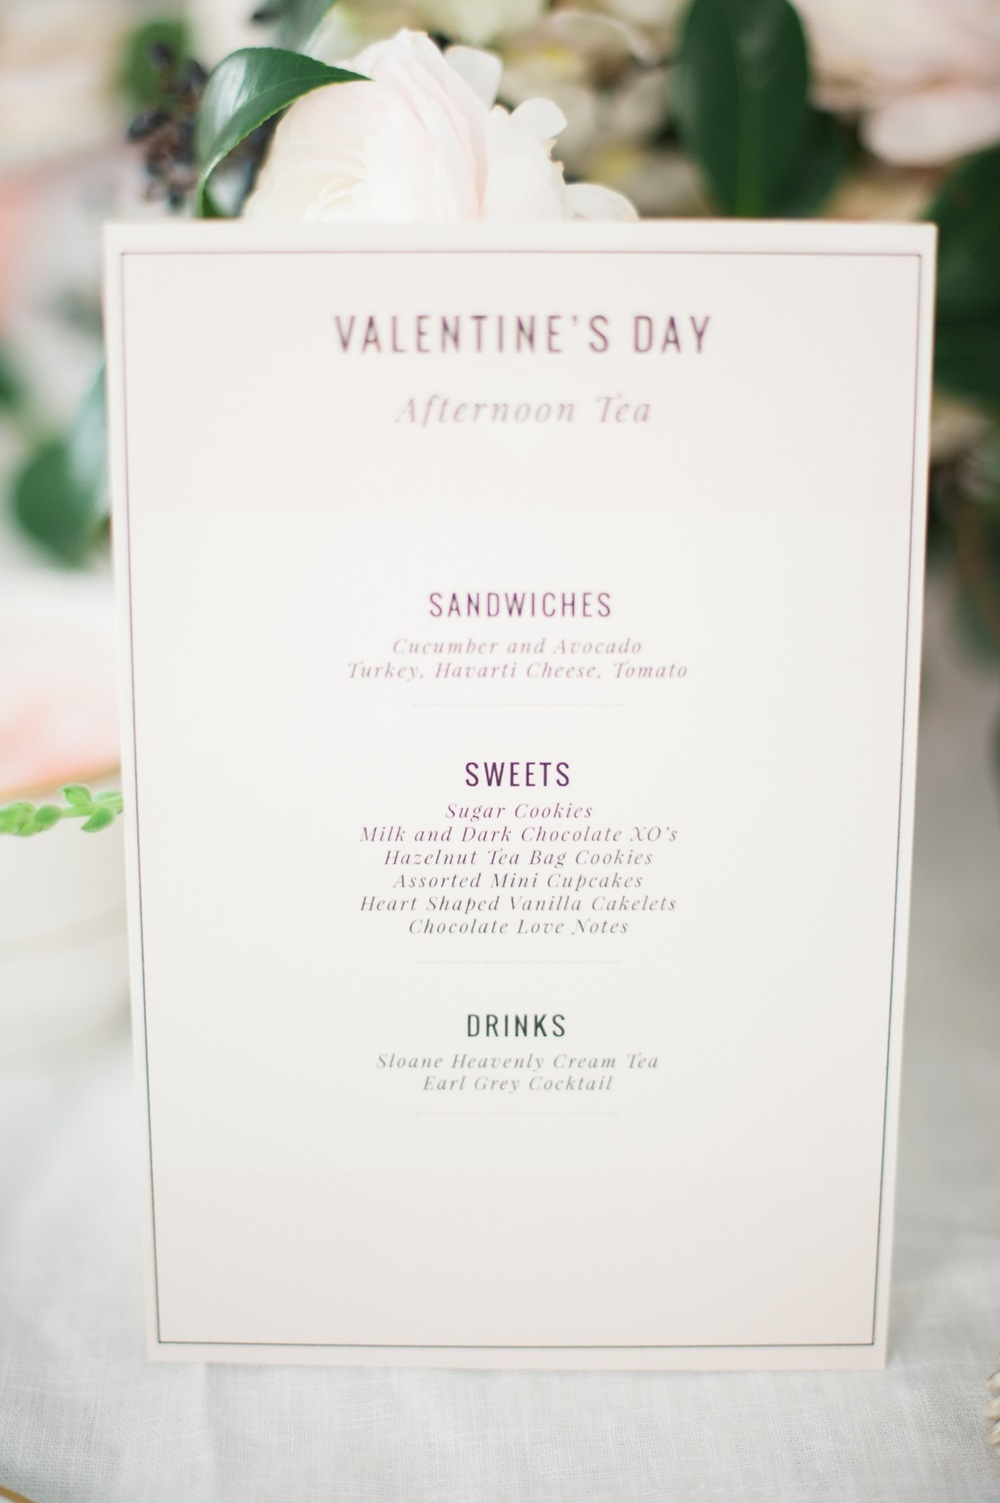 valentines-day-tea-party-menu-the-dish.jpg